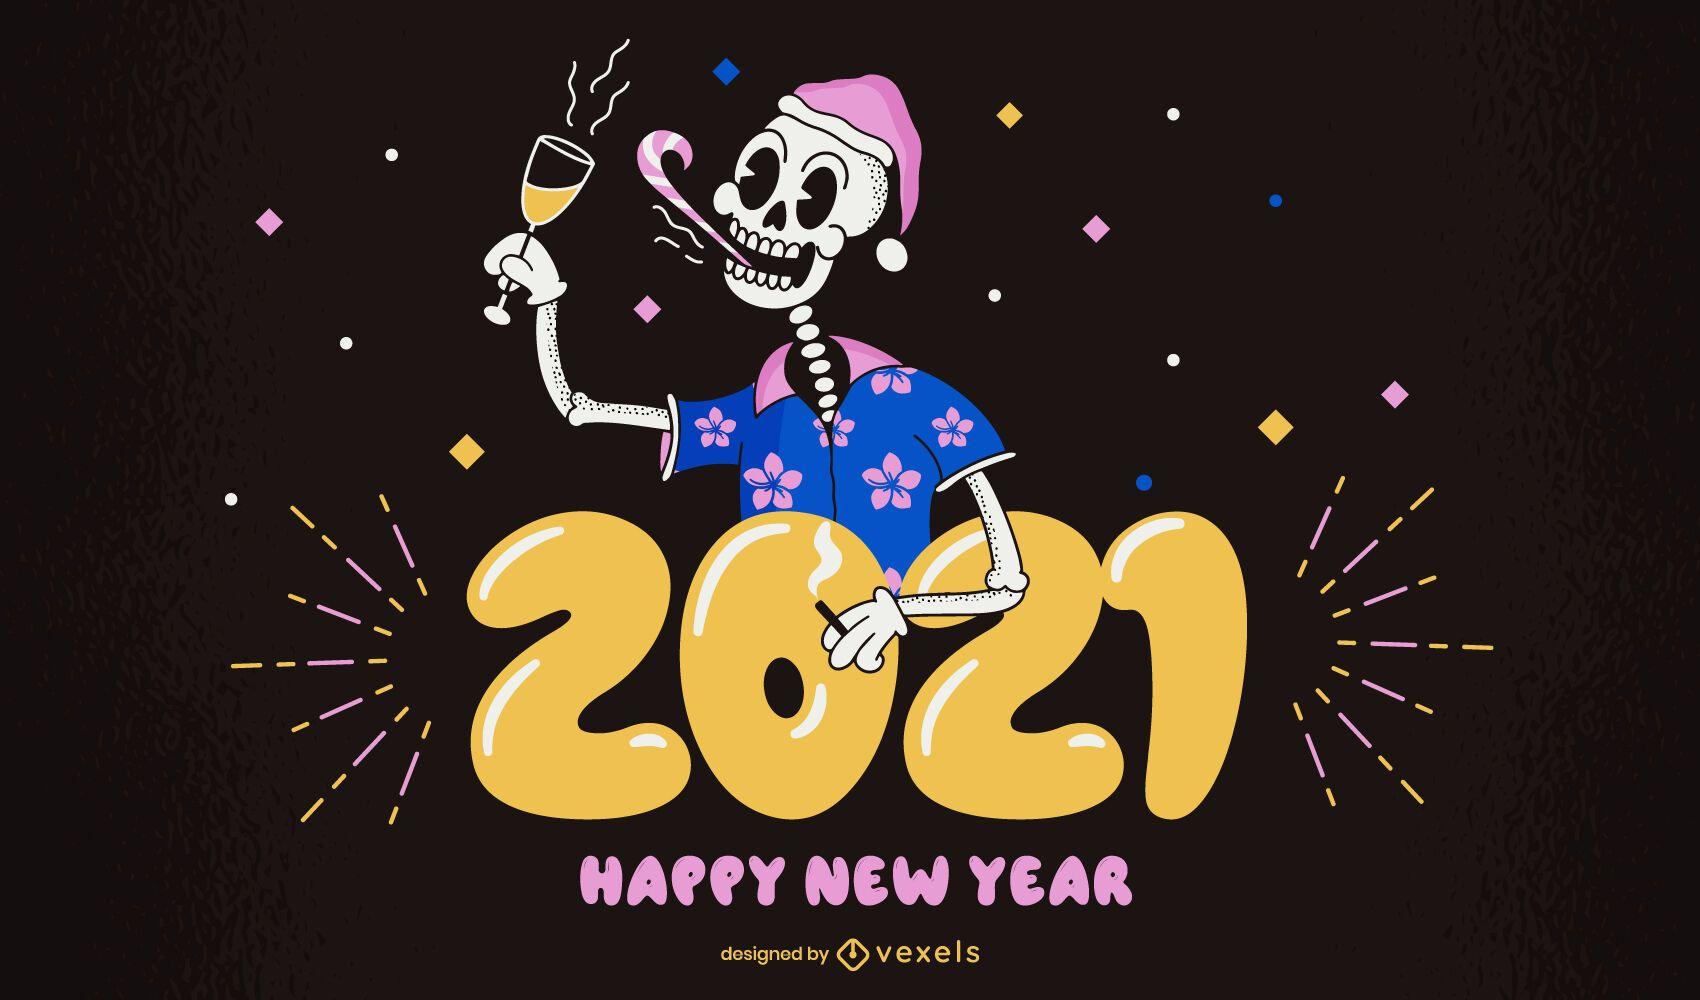 2021 happy new year illustration design